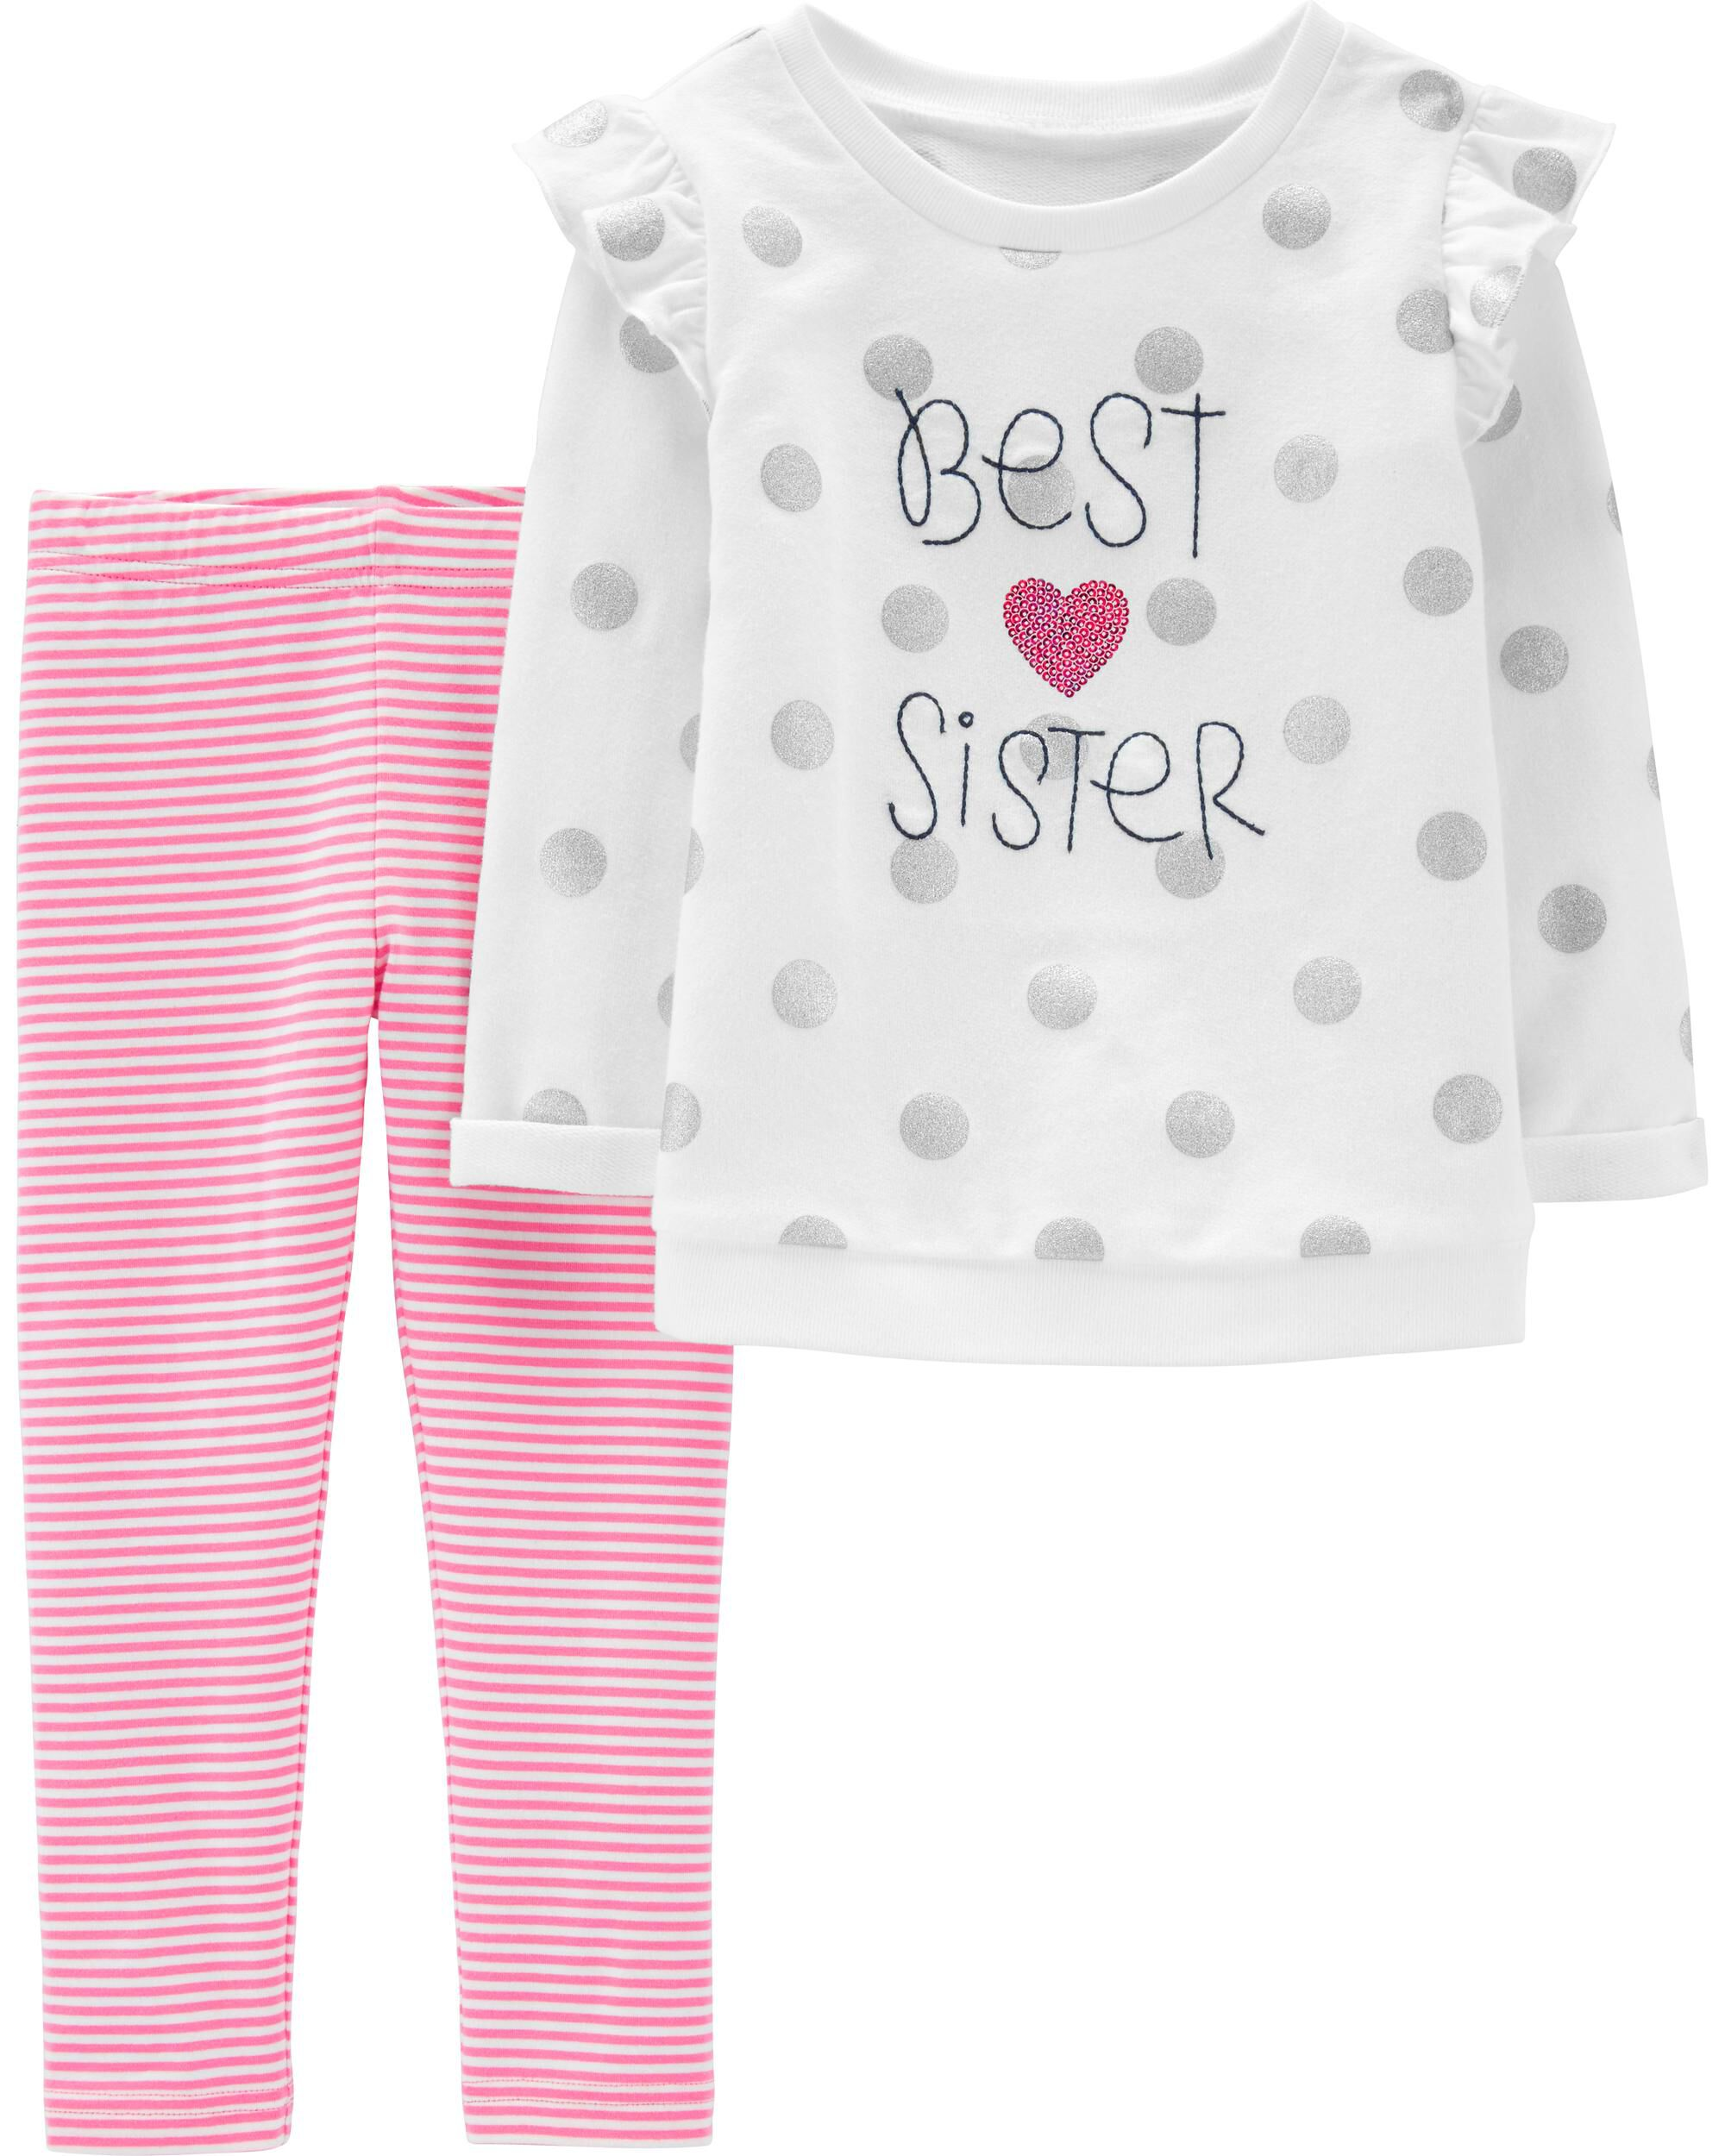 New Carter/'s Girls 2 Piece Outfit Top /& Pants Set NB 3m 6m 9m Cute Little Sister